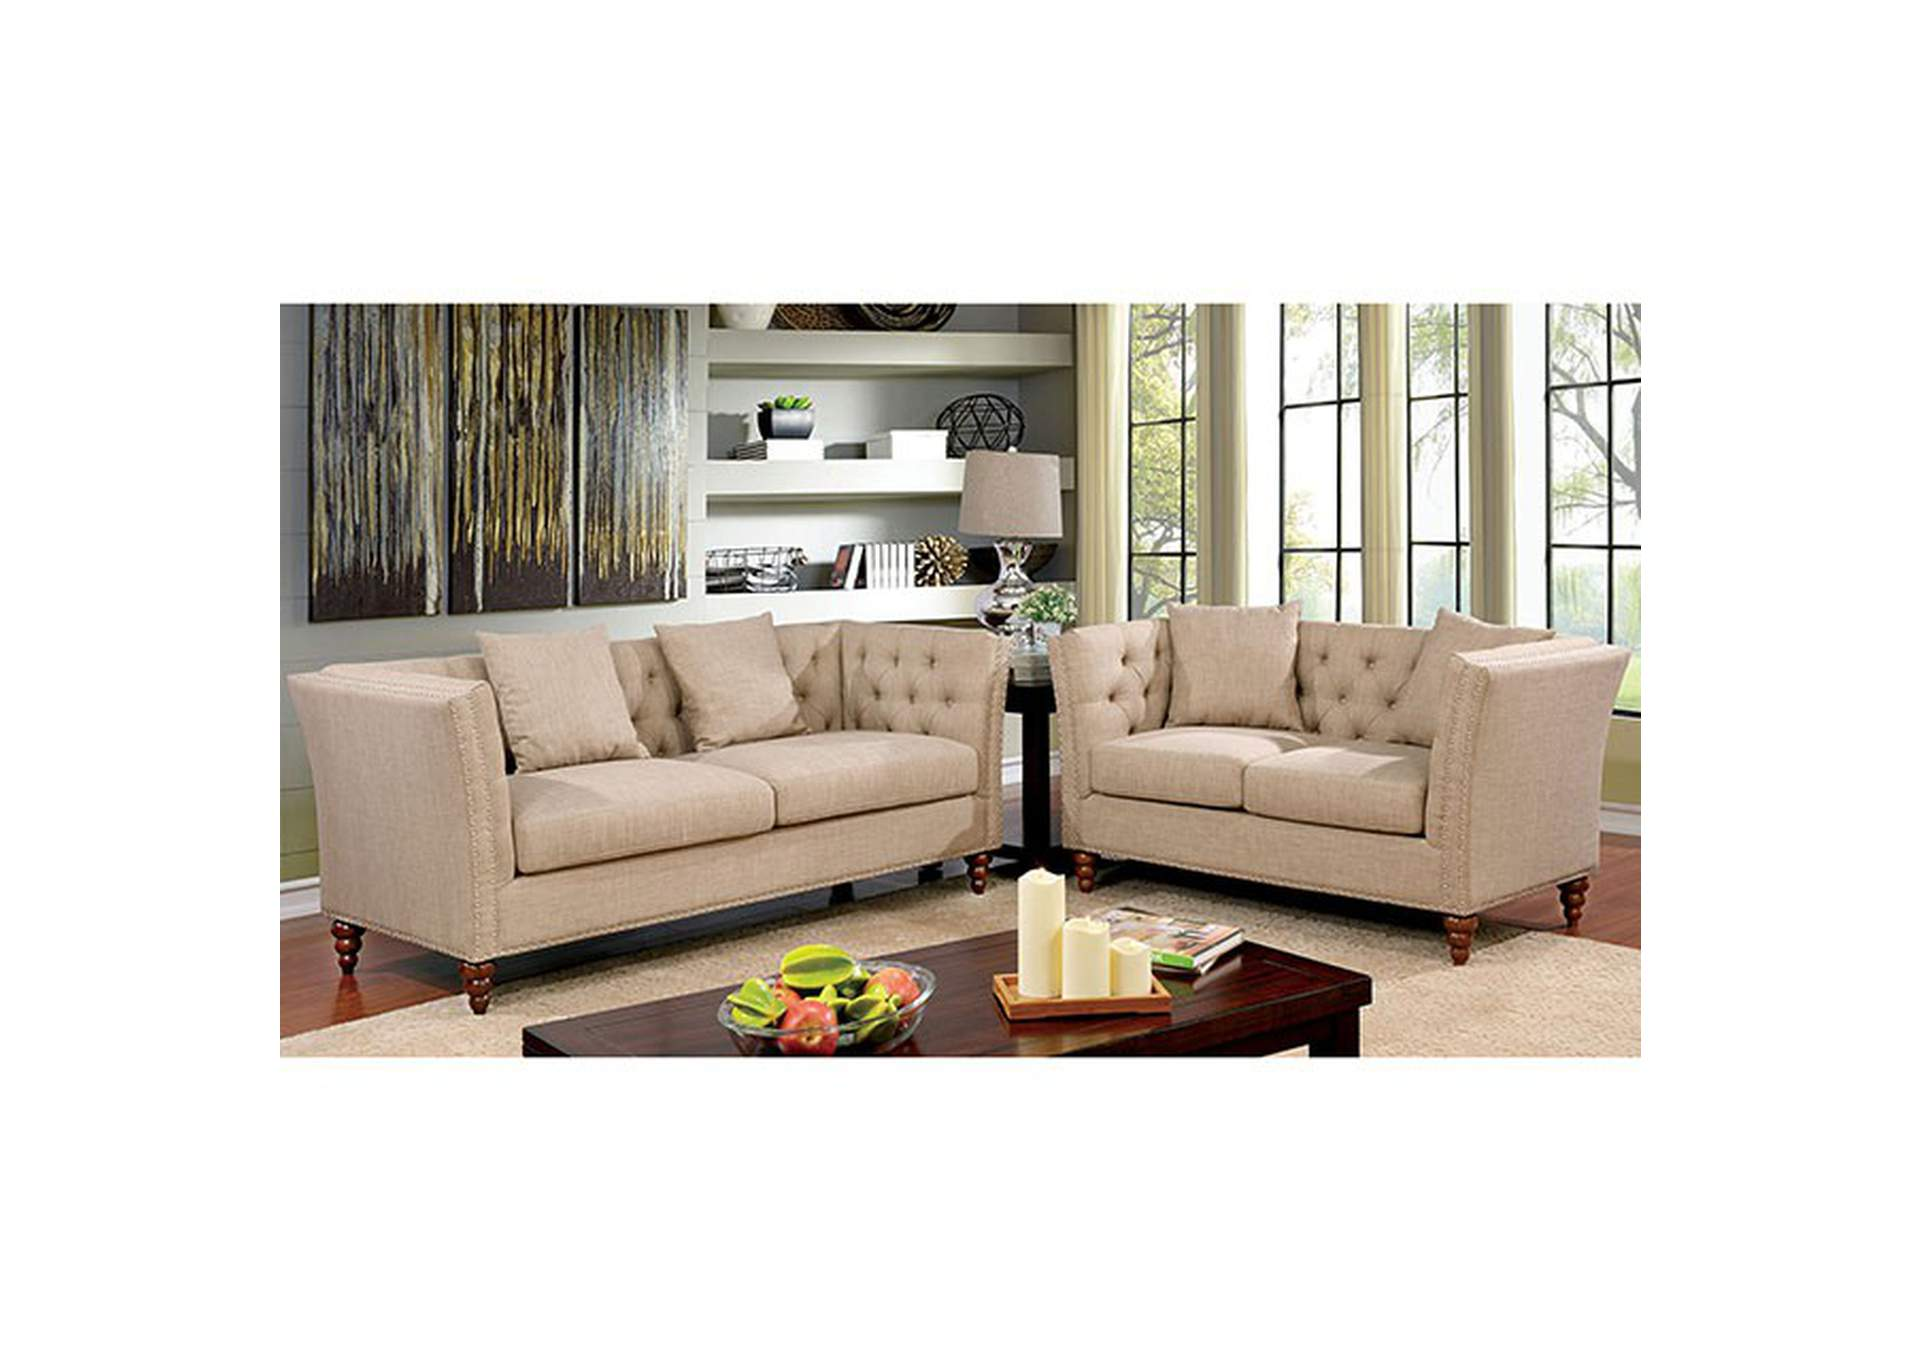 Imani Beige Sofa And Loveseat,Furniture Of America